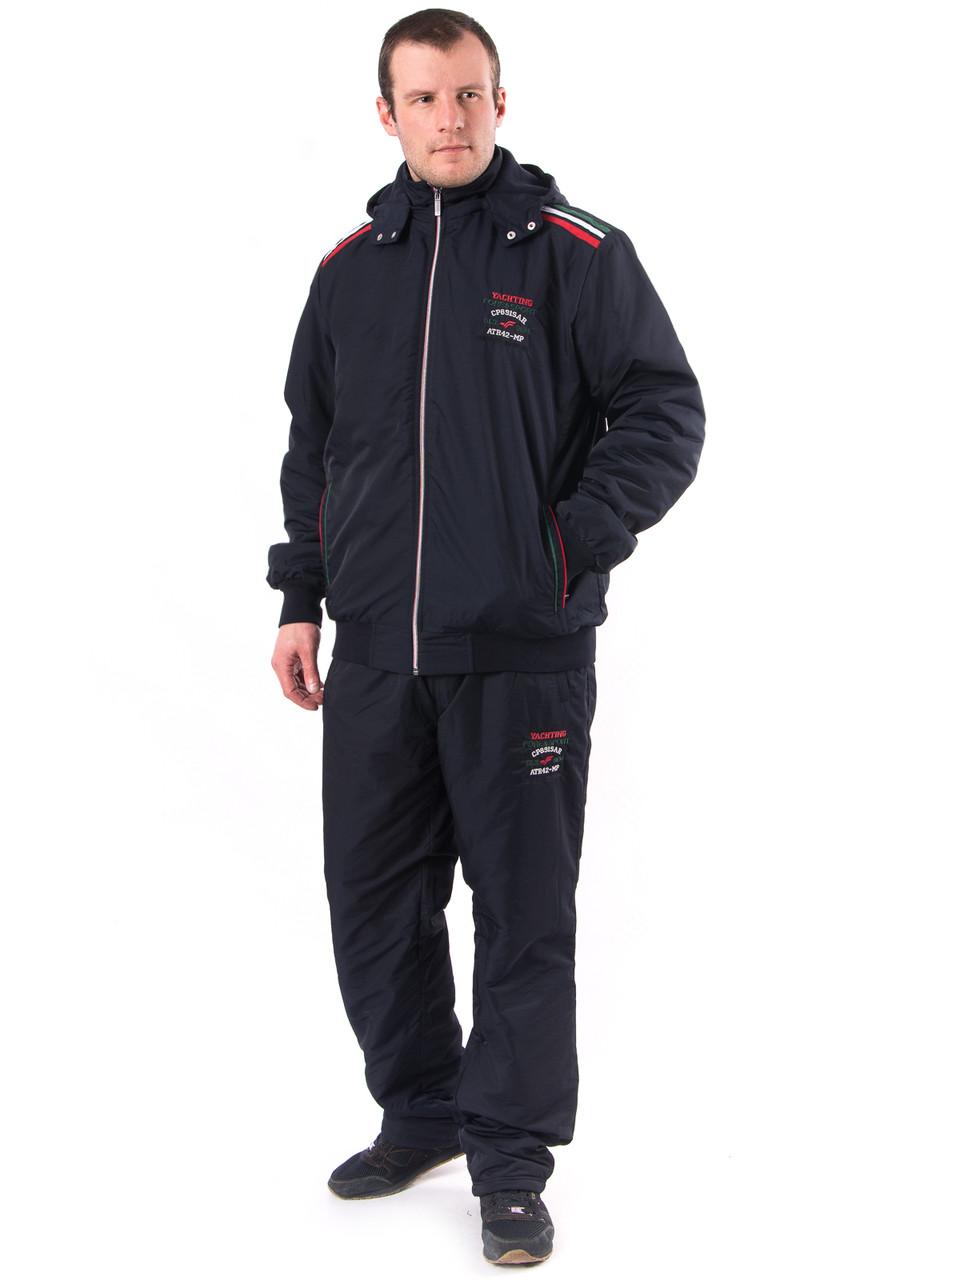 Мужской теплый спортивный костюм плащевка на флисе т.м. Fore 1146 ... 130aaa777e5